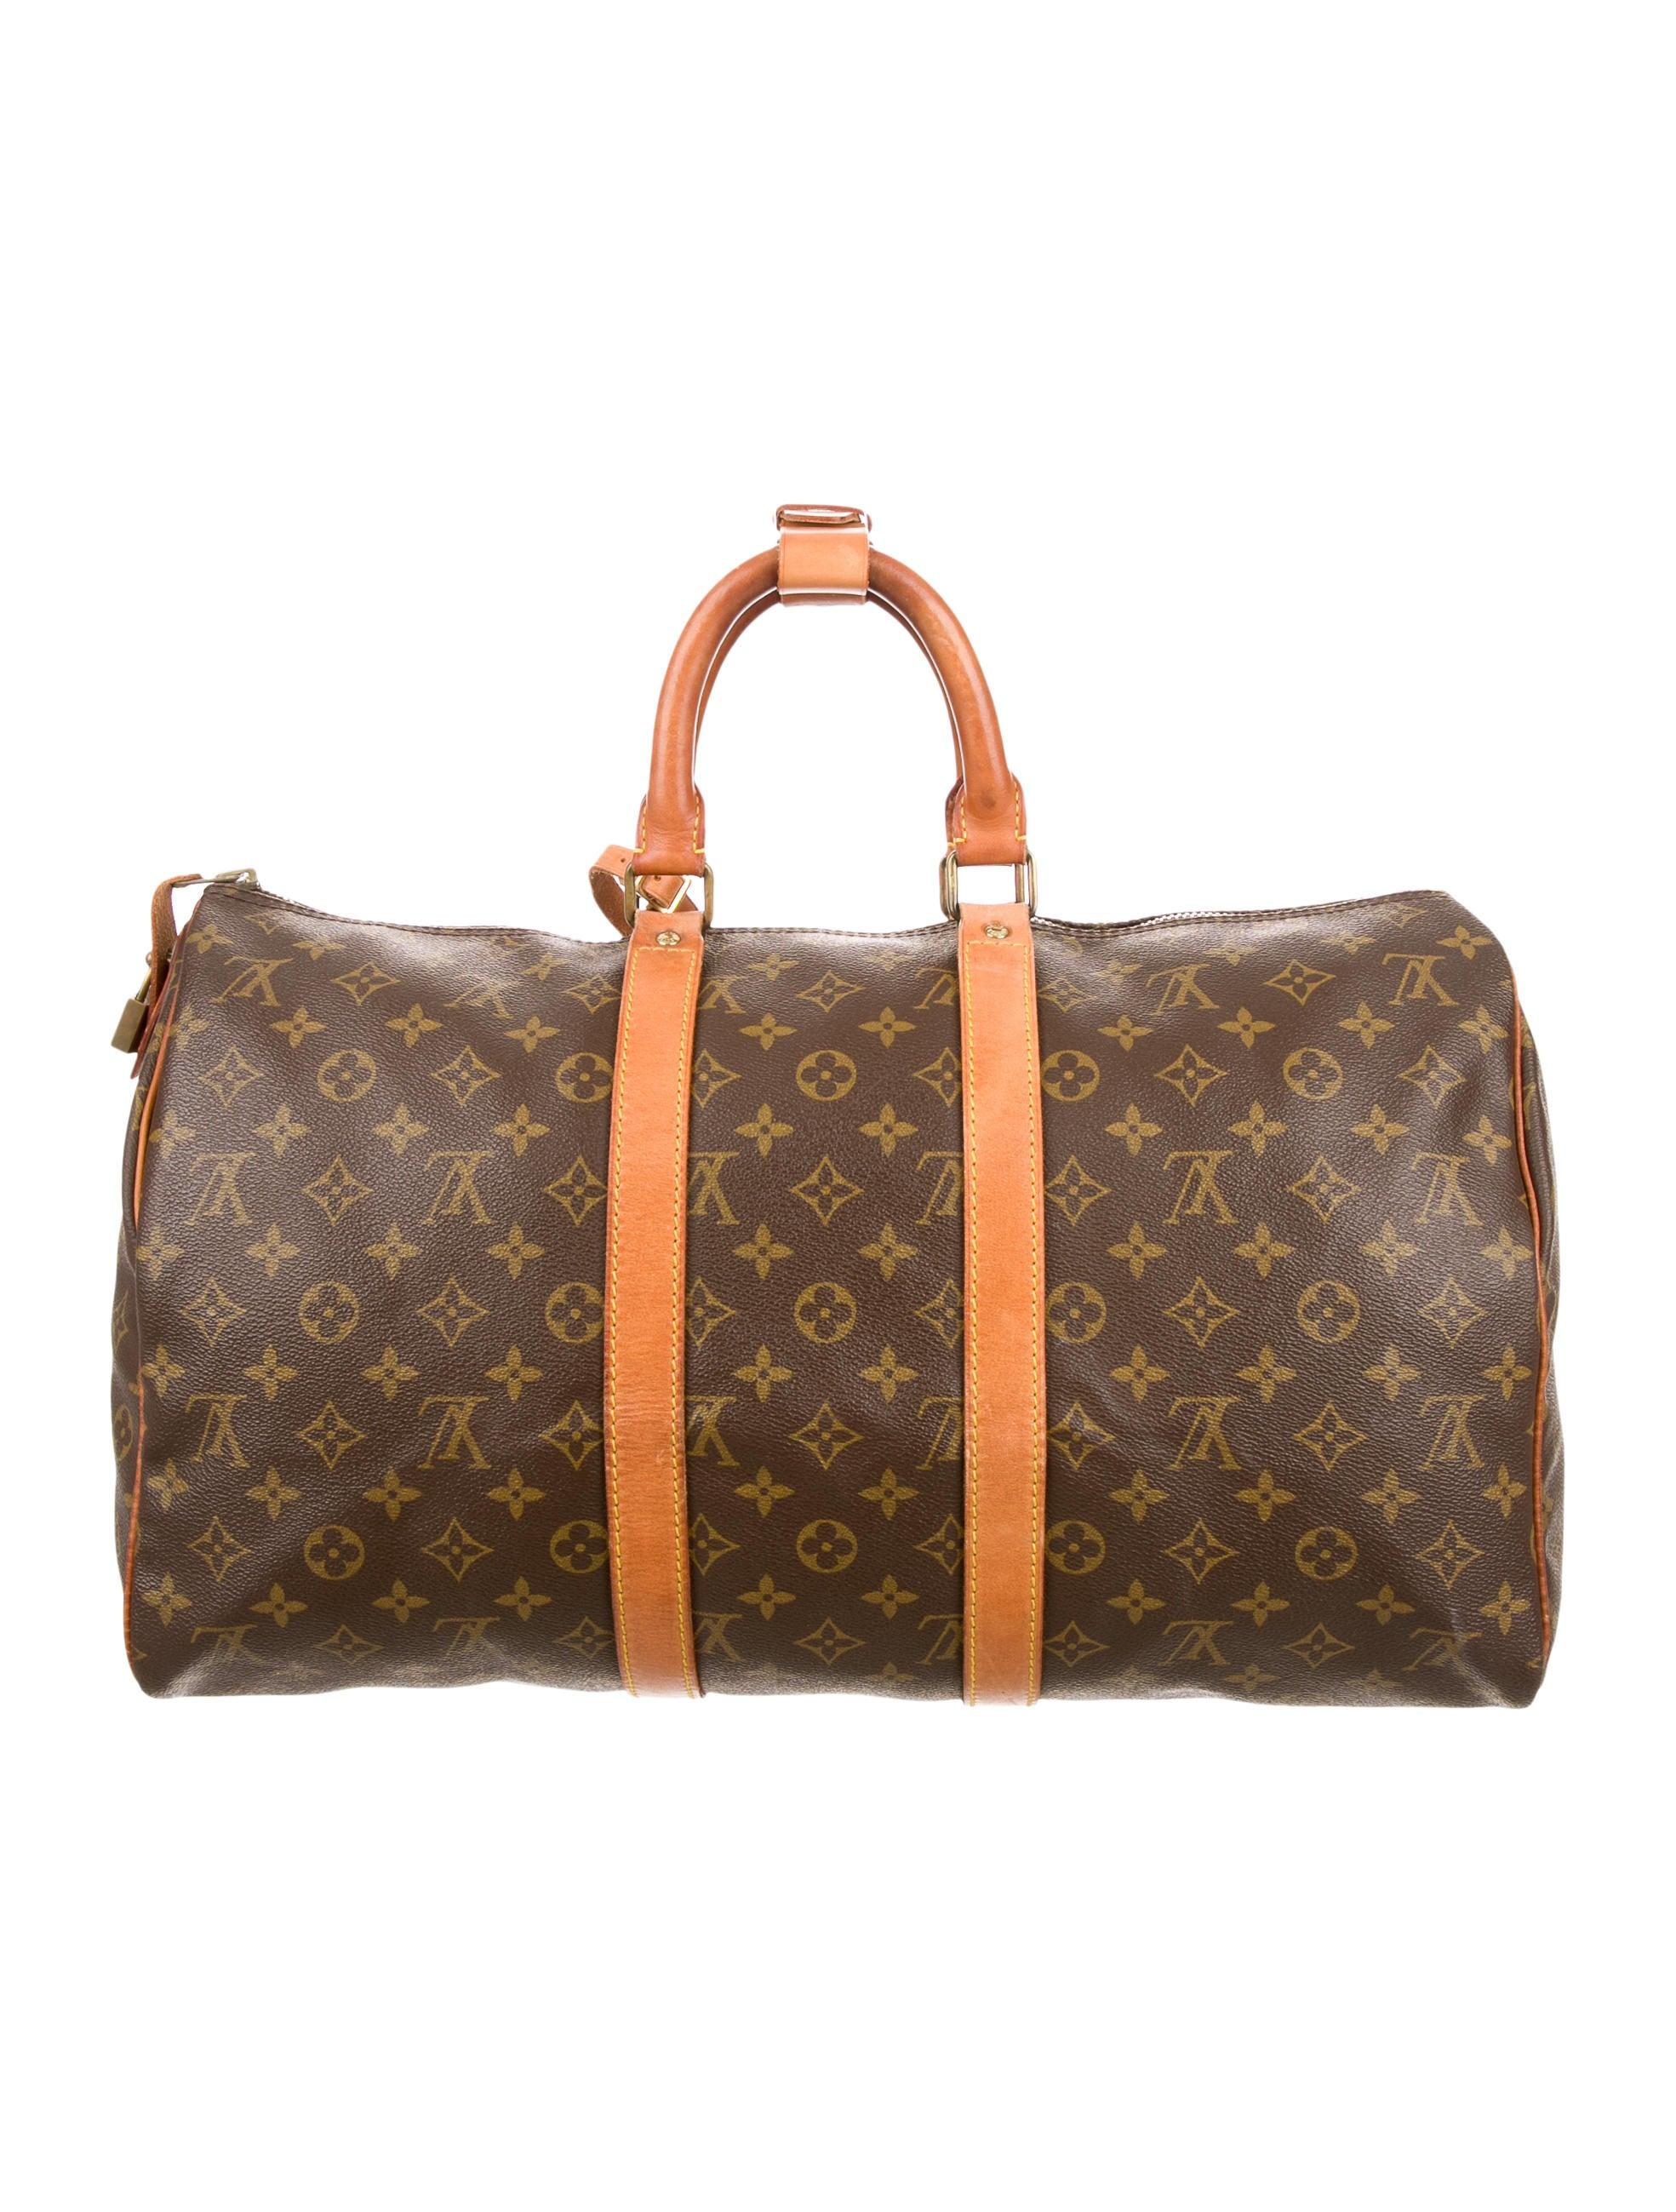 louis vuitton monogram speedy 45 handbags lou111920 the realreal. Black Bedroom Furniture Sets. Home Design Ideas